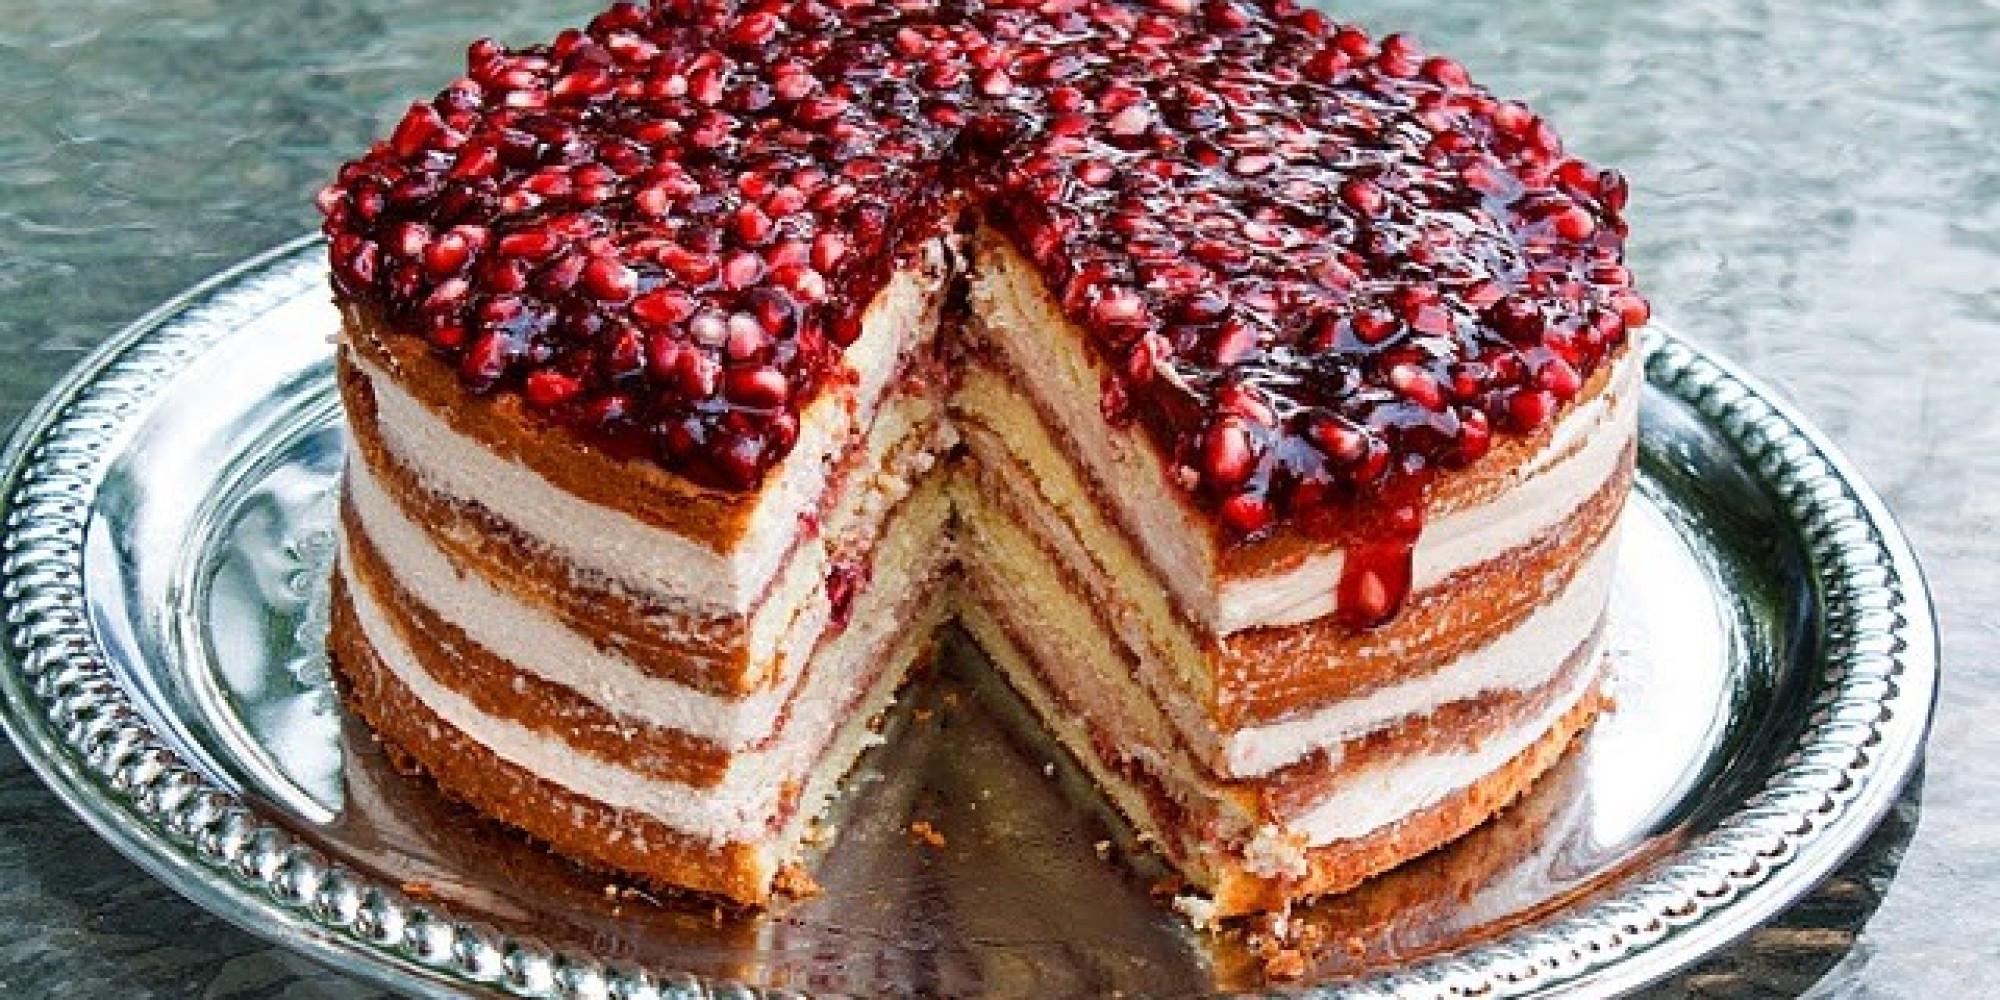 Best Christmas Cake Recipe  The Most Stunning Christmas Dessert Recipes Ever PHOTOS